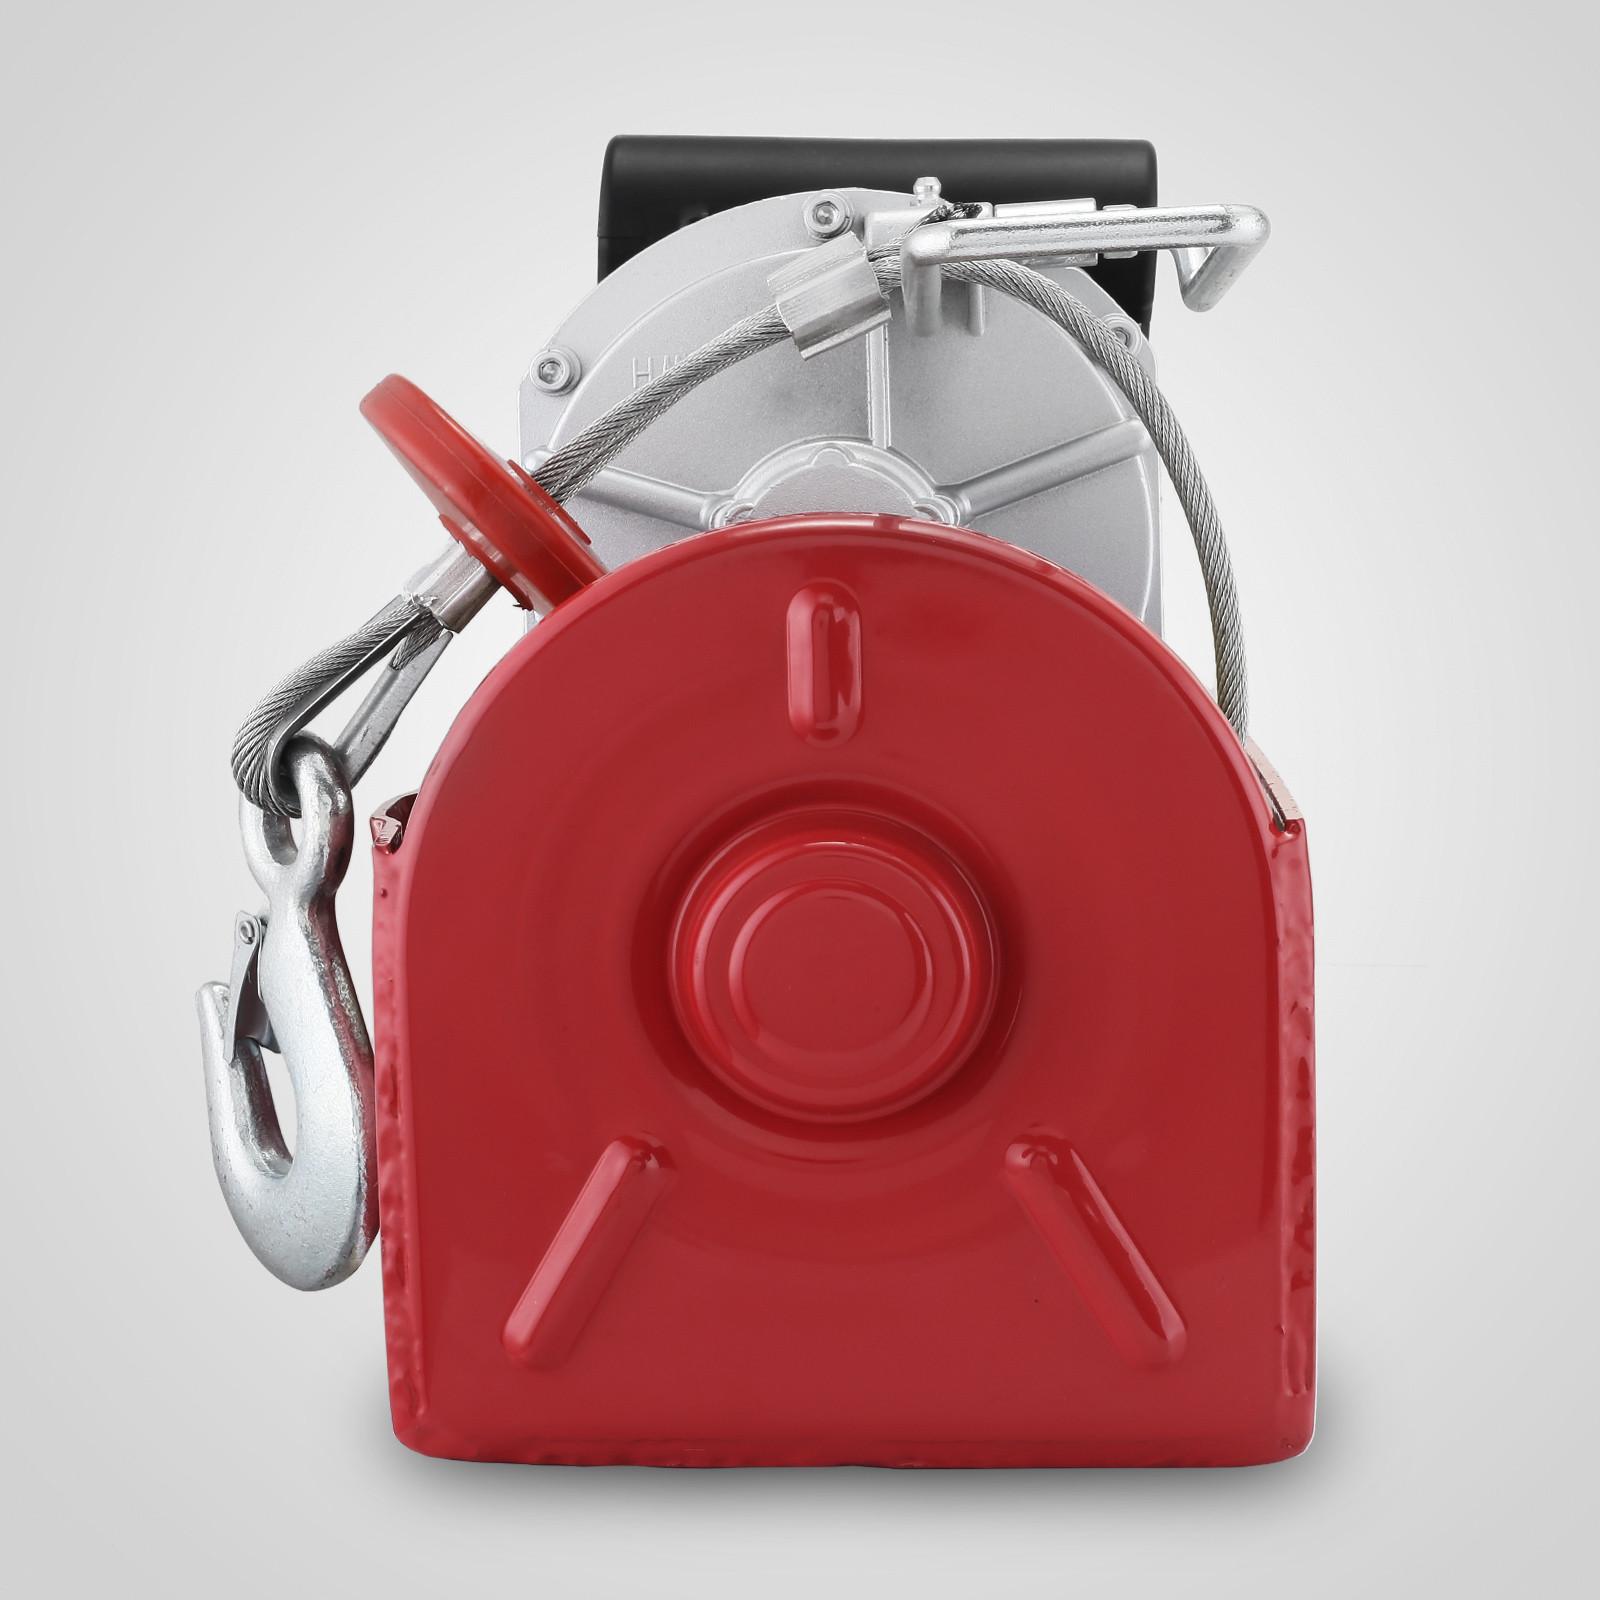 100kg-900kg-Electric-Hoist-Winch-Lifting-Engine-Crane-Cable-Lift-Hook-Garage miniature 65